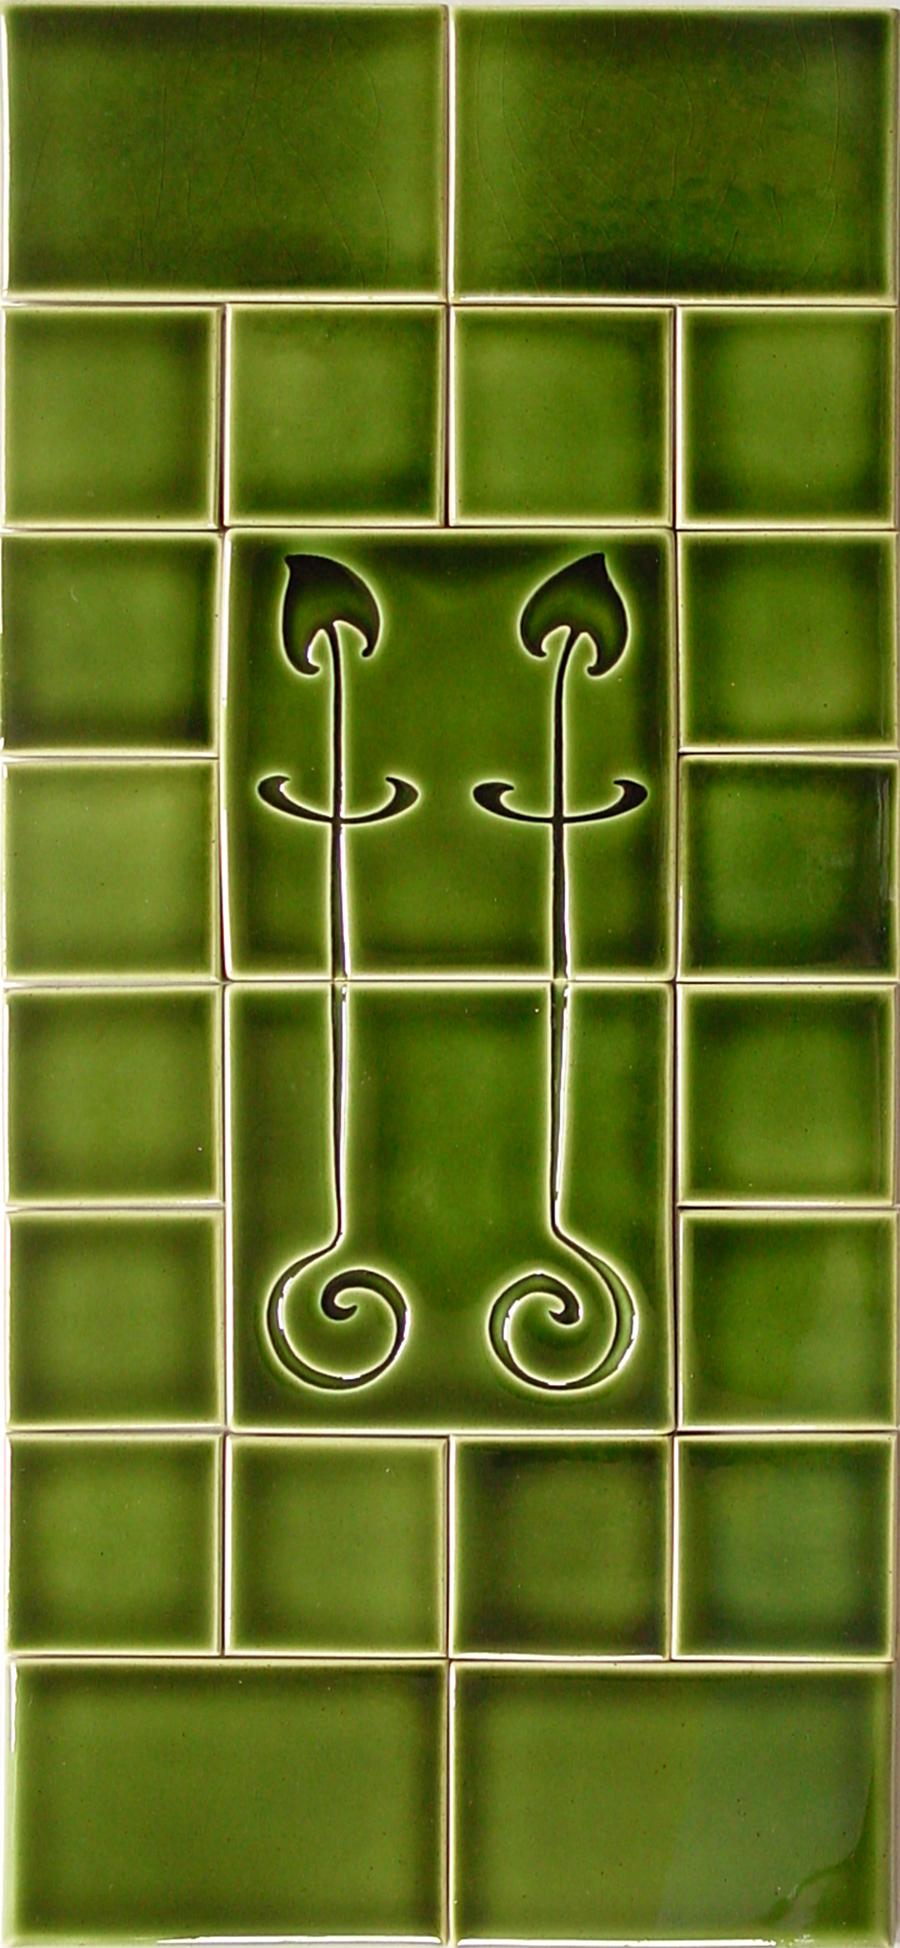 Evergreen glaze